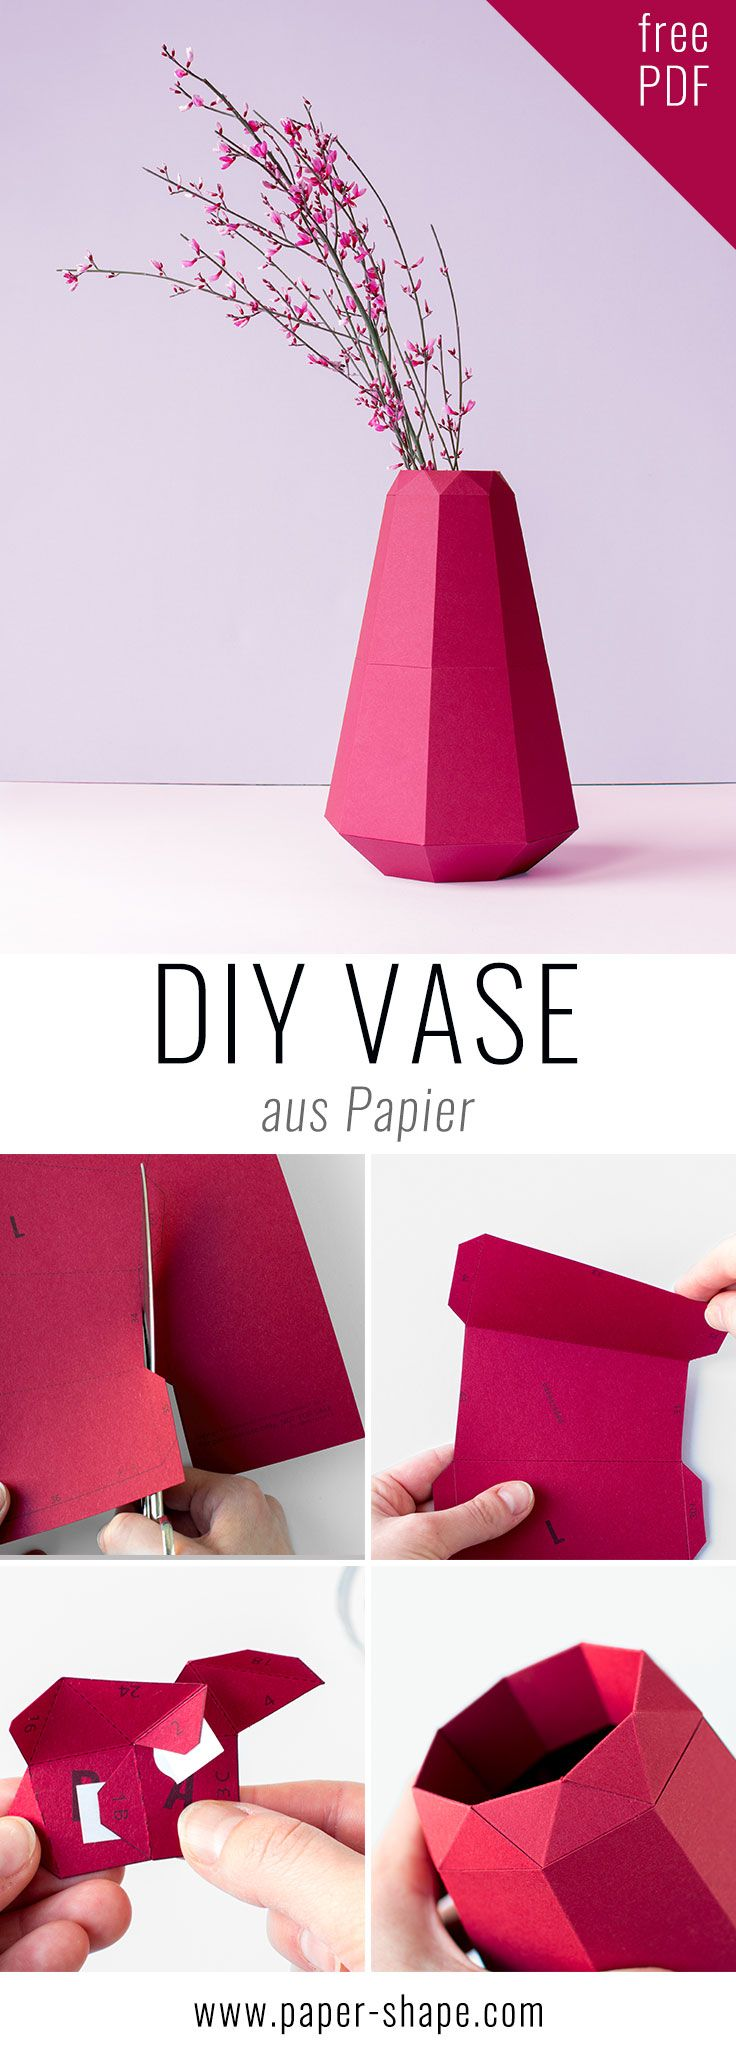 Diy Vase Aus Papier Im Origami-Look [Vorlage] DIY Vase aus Papier im Origami-Look [Vorlage] Diy Paper Crafts how to make paper vase diy craft